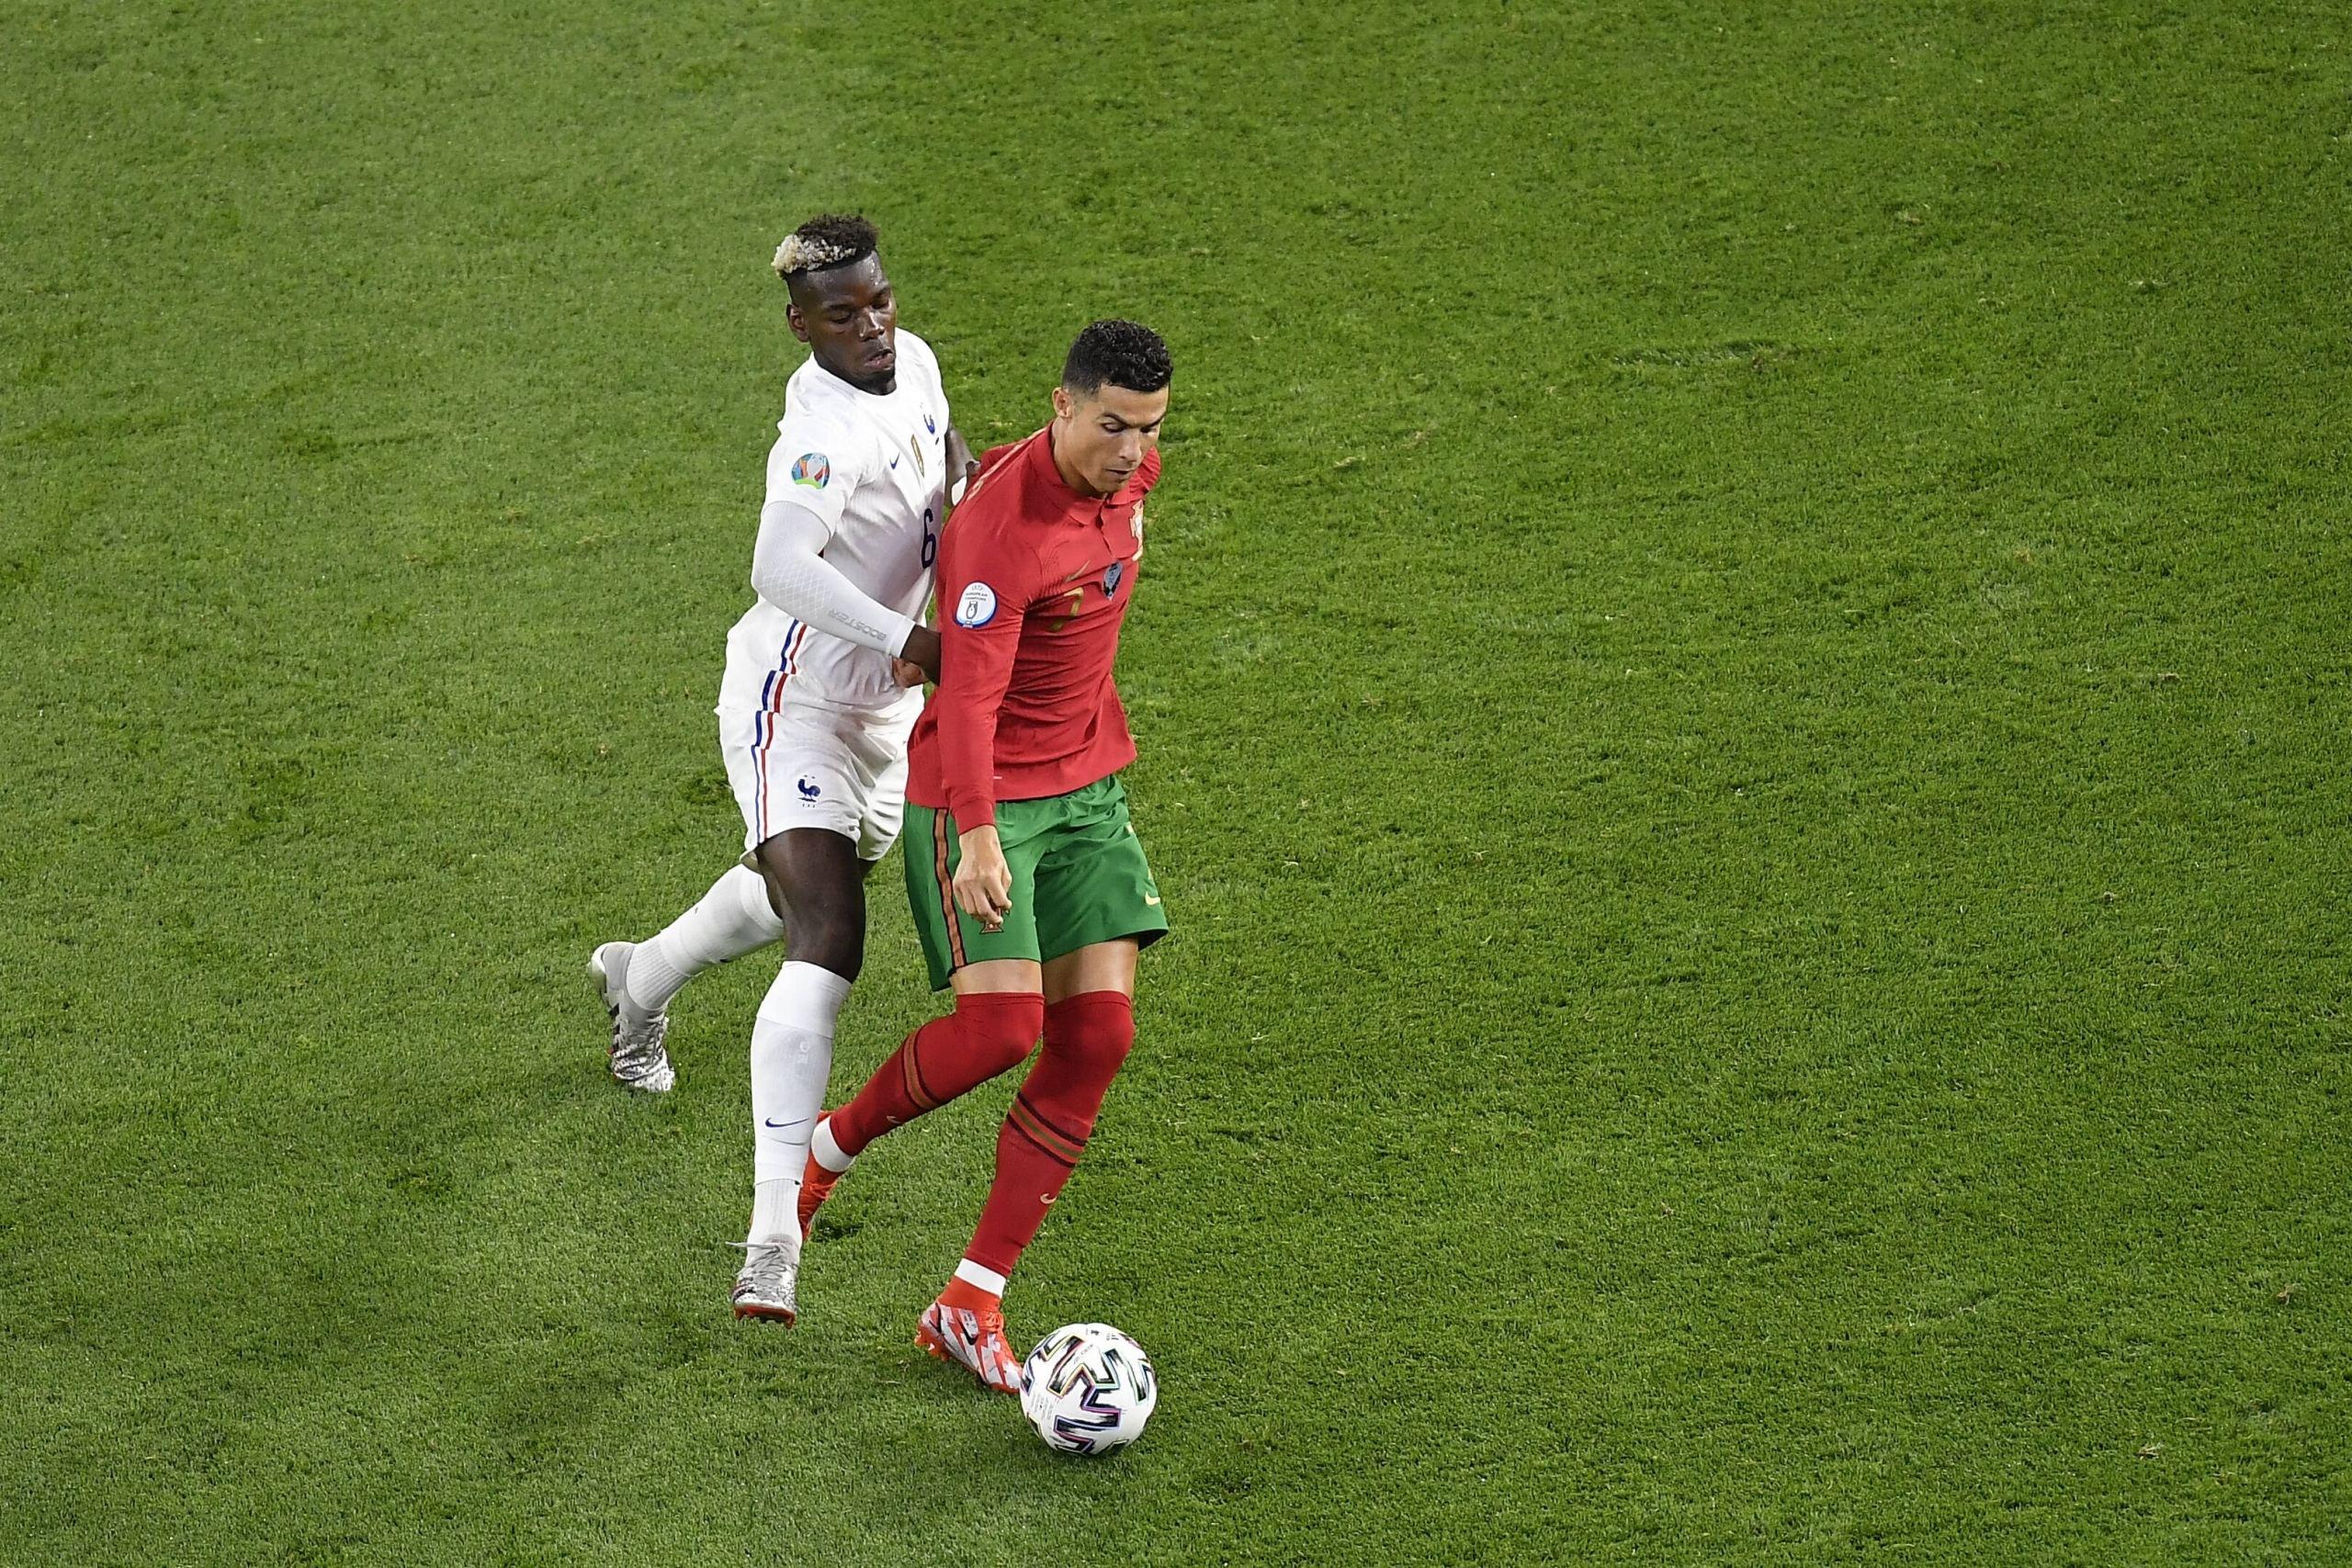 EURO 2020: Cristiano Ronaldo